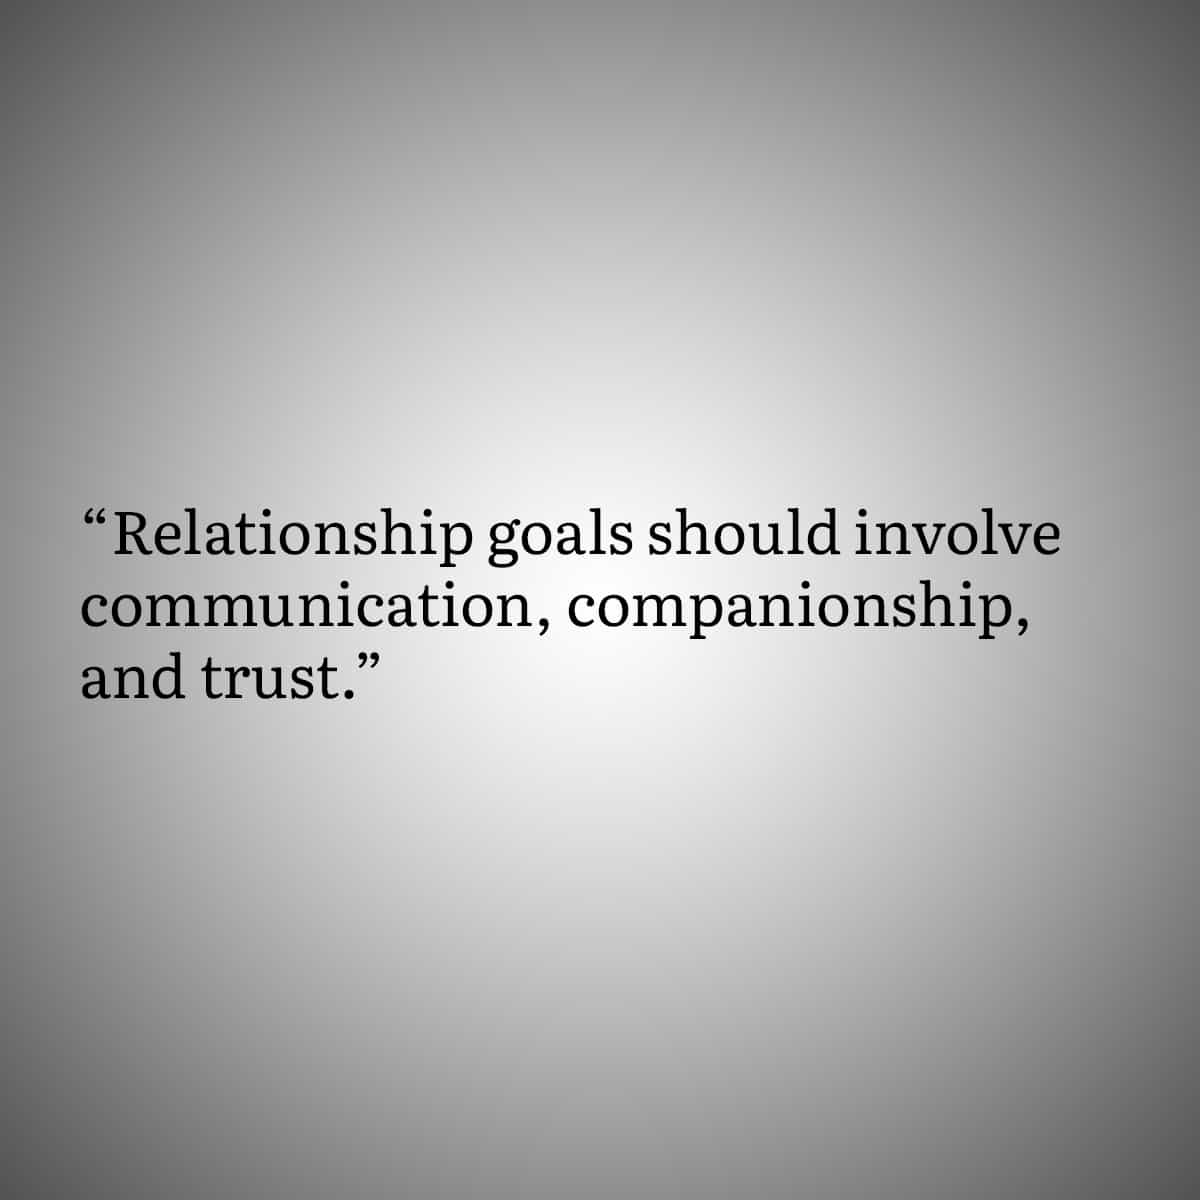 Relationship goals should involve communication, companionship, and trust.